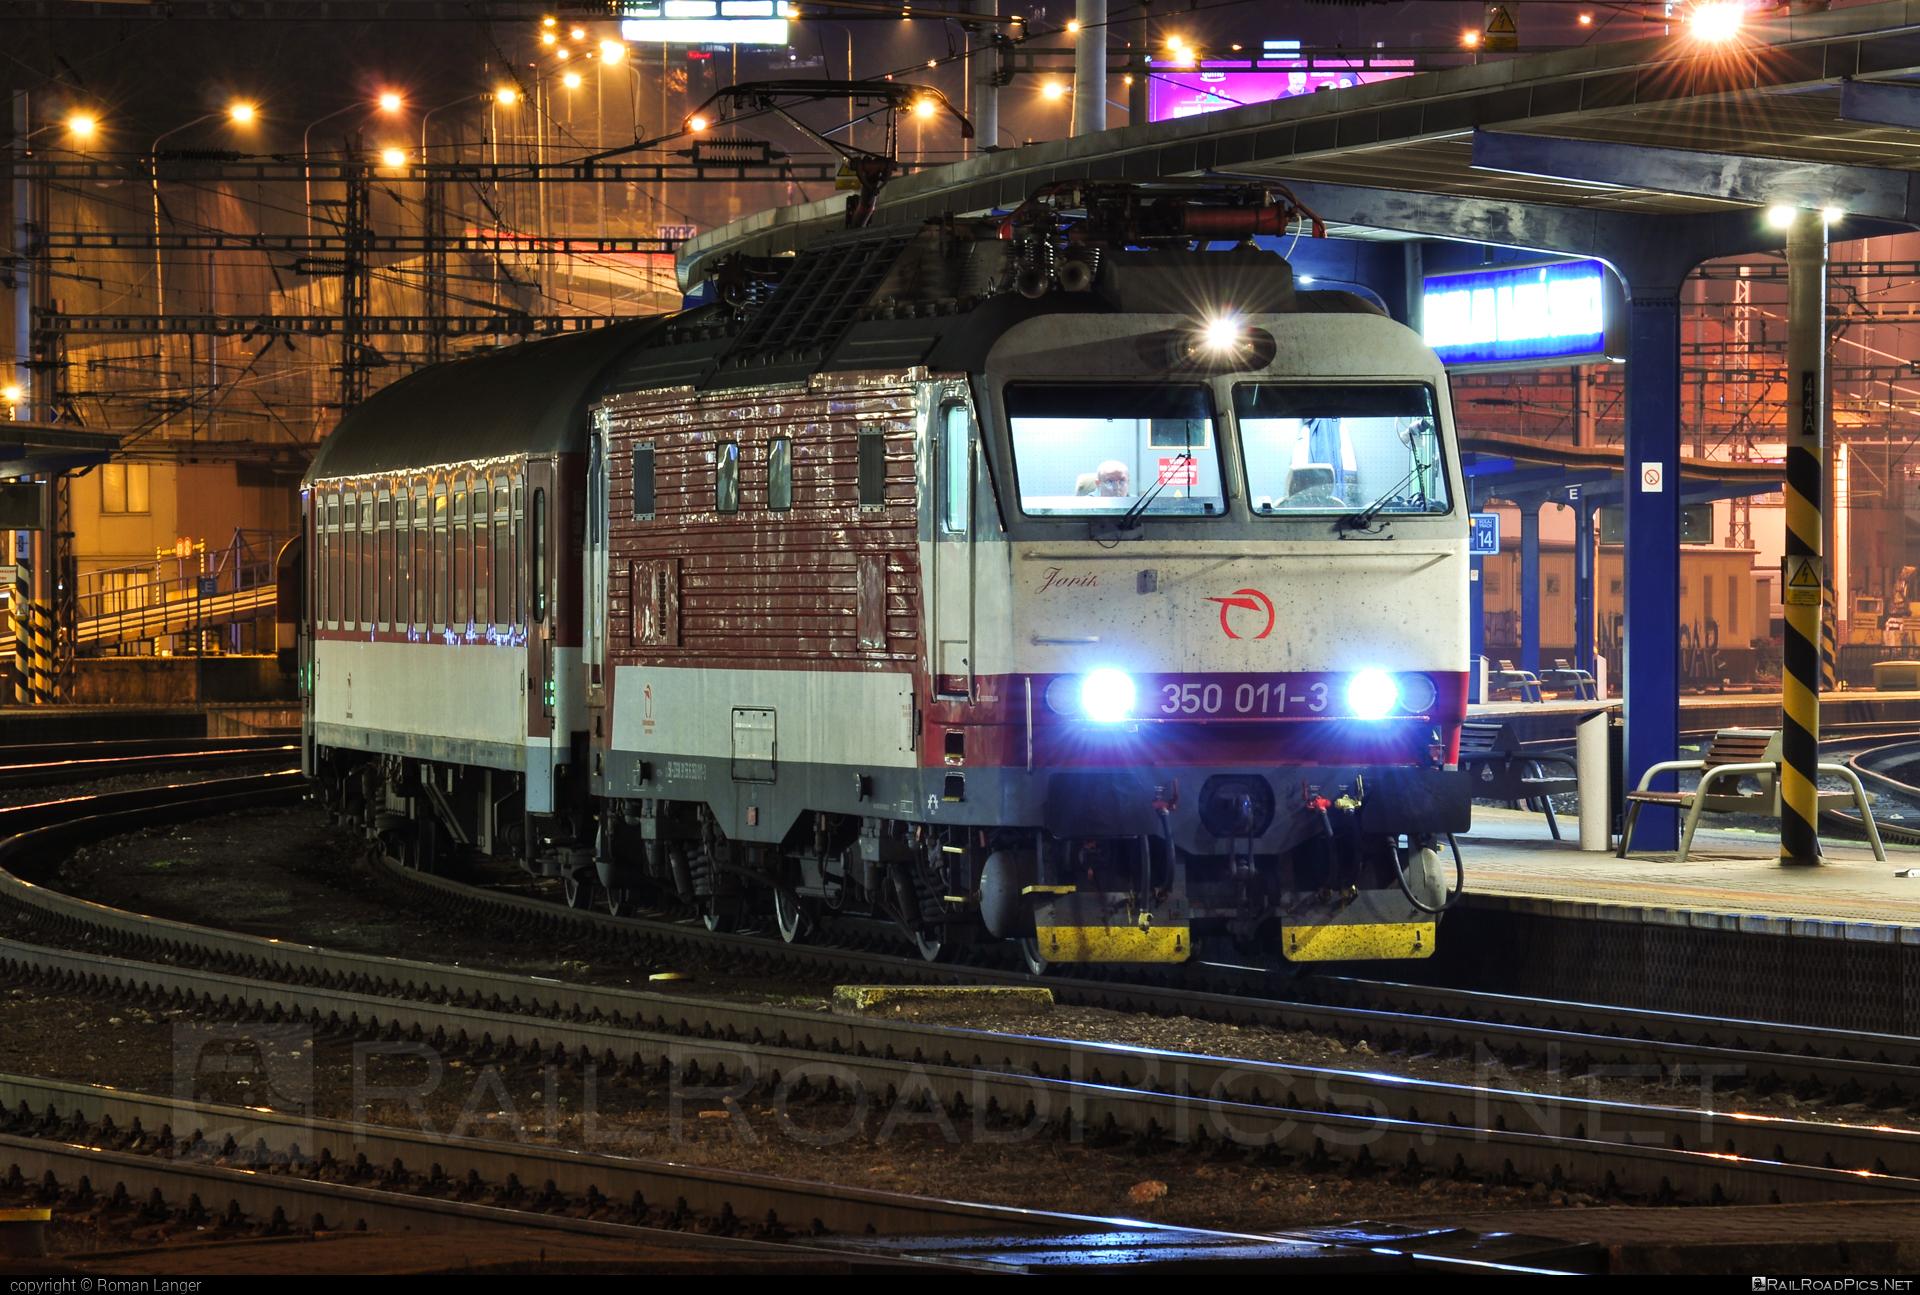 Škoda 55E - 350 011-3 operated by Železničná Spoločnost' Slovensko, a.s. #ZeleznicnaSpolocnostSlovensko #gorila #locomotive350 #skoda #skoda55e #zssk